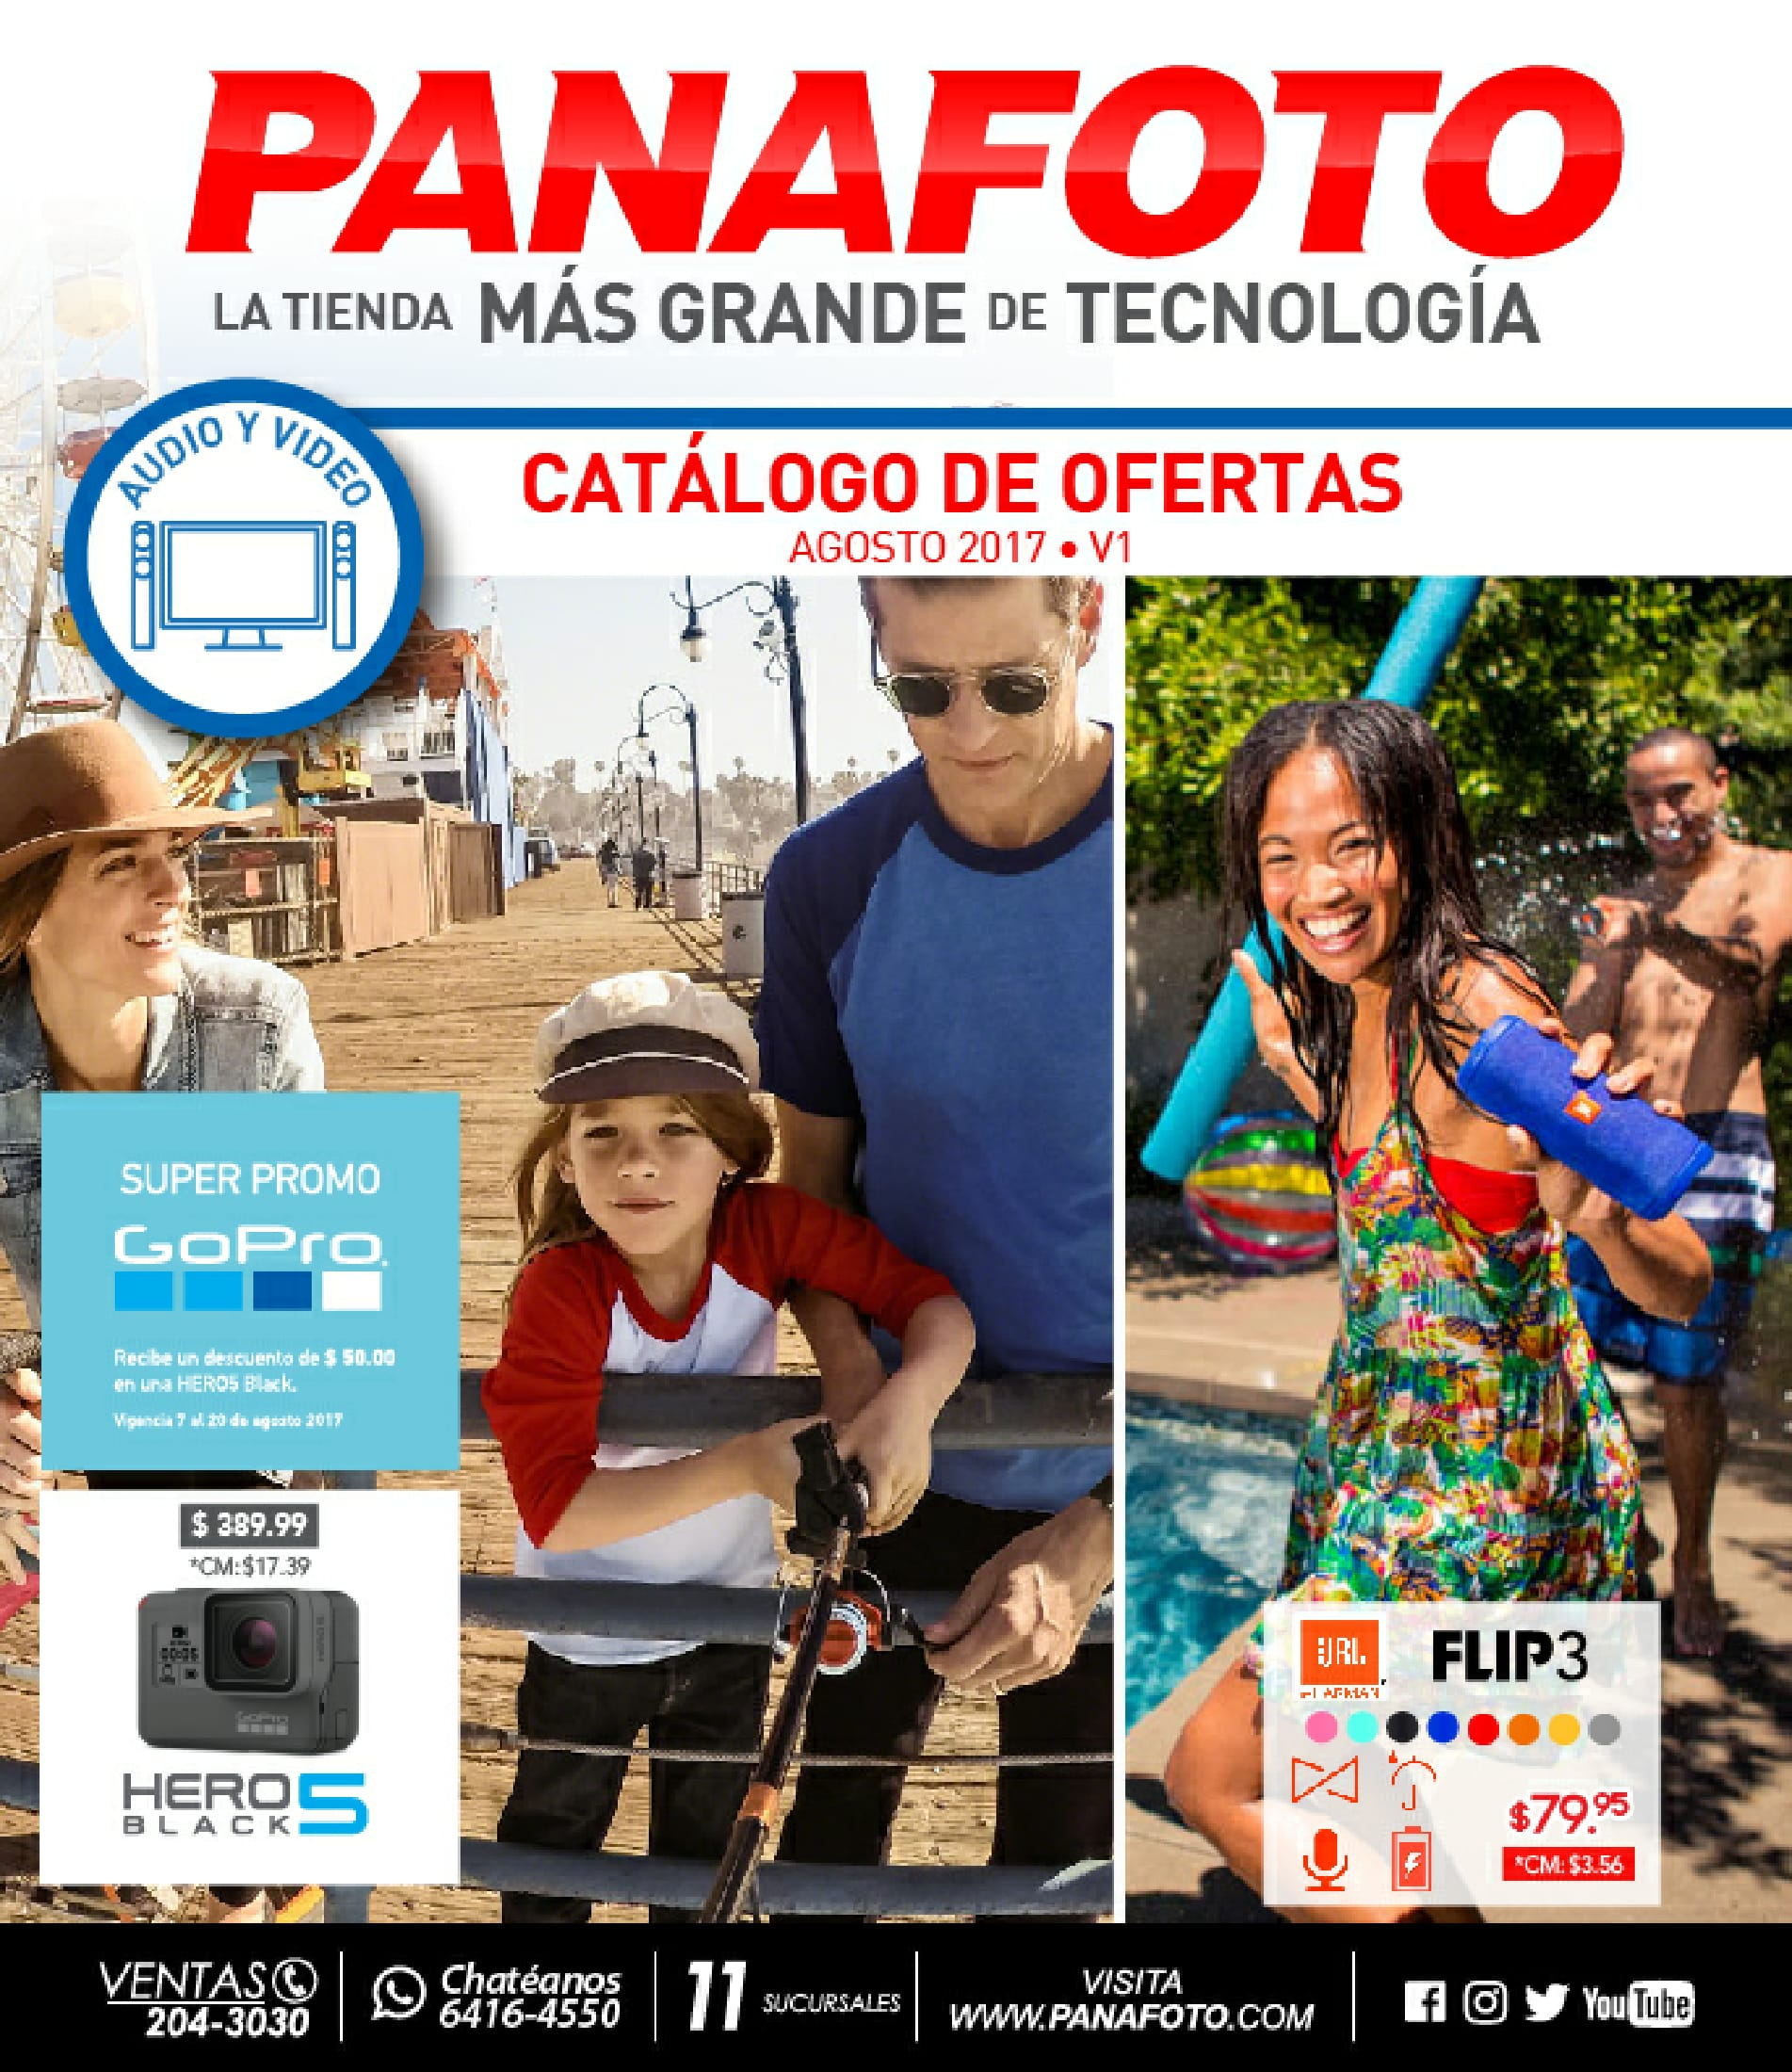 Catalogo panafoto agosto 2017 (audio - video)